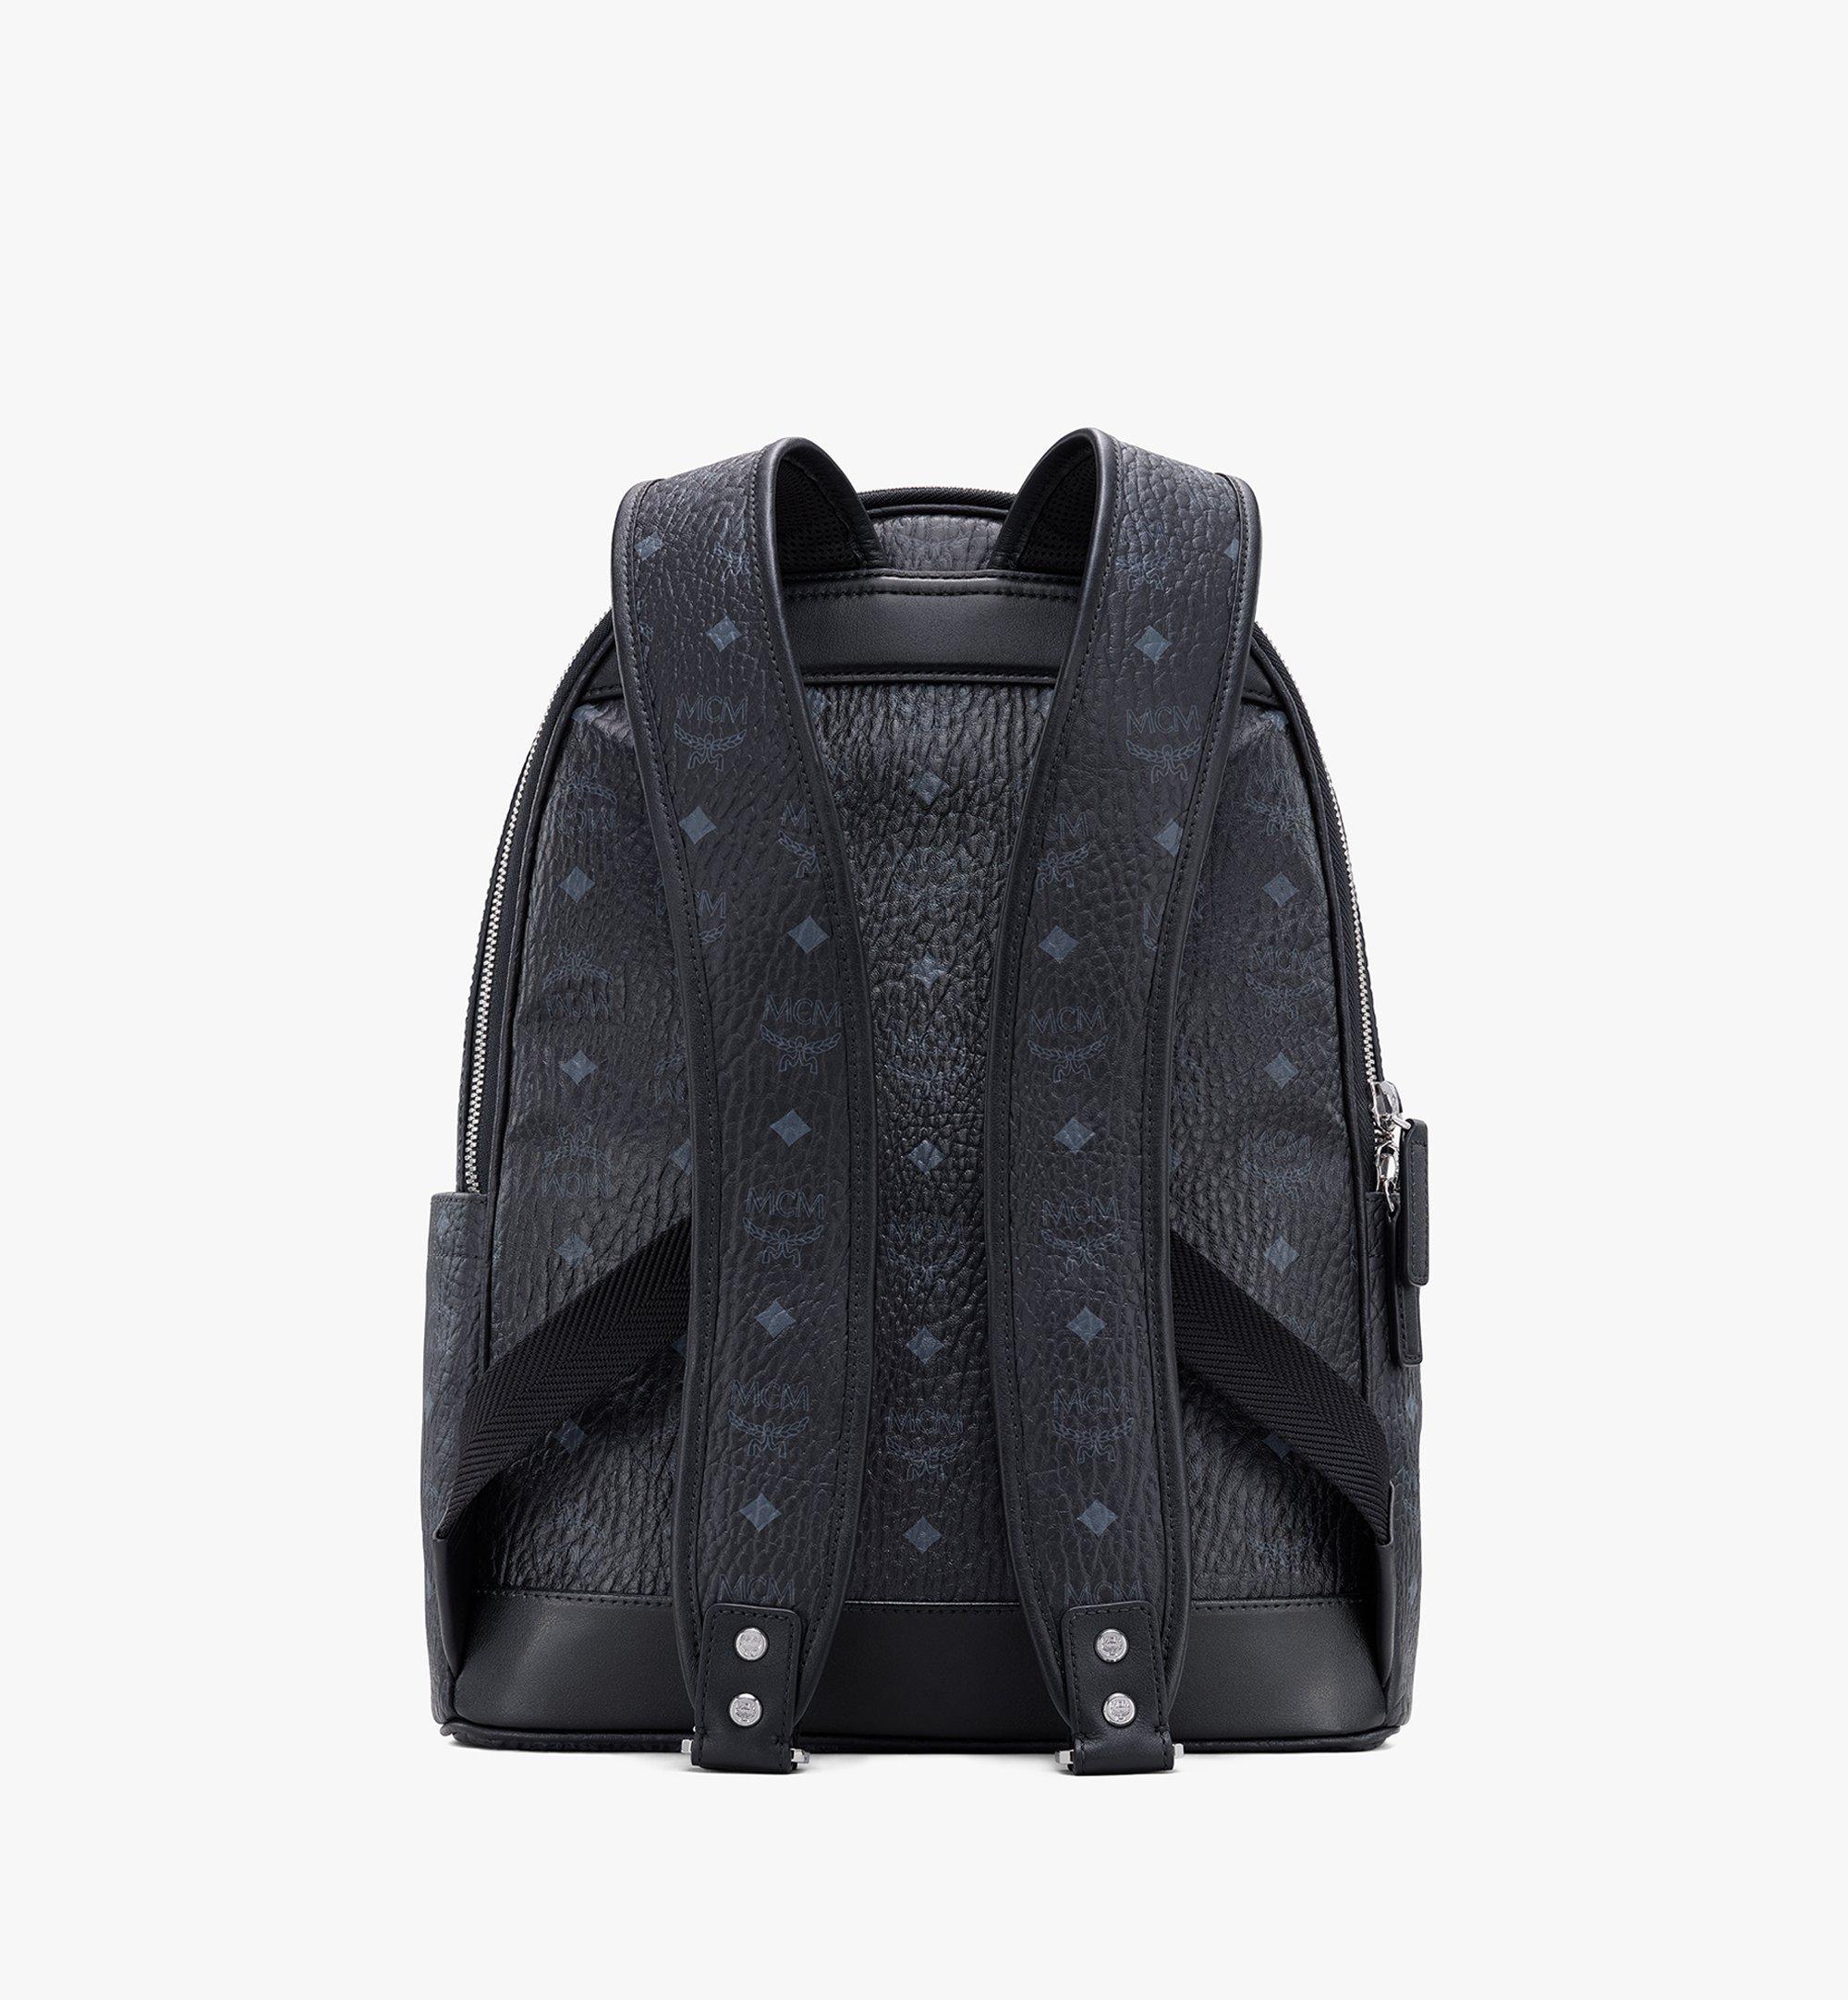 MCM Stark Backpack in Visetos Black MMKASVE10BK001 Alternate View 2